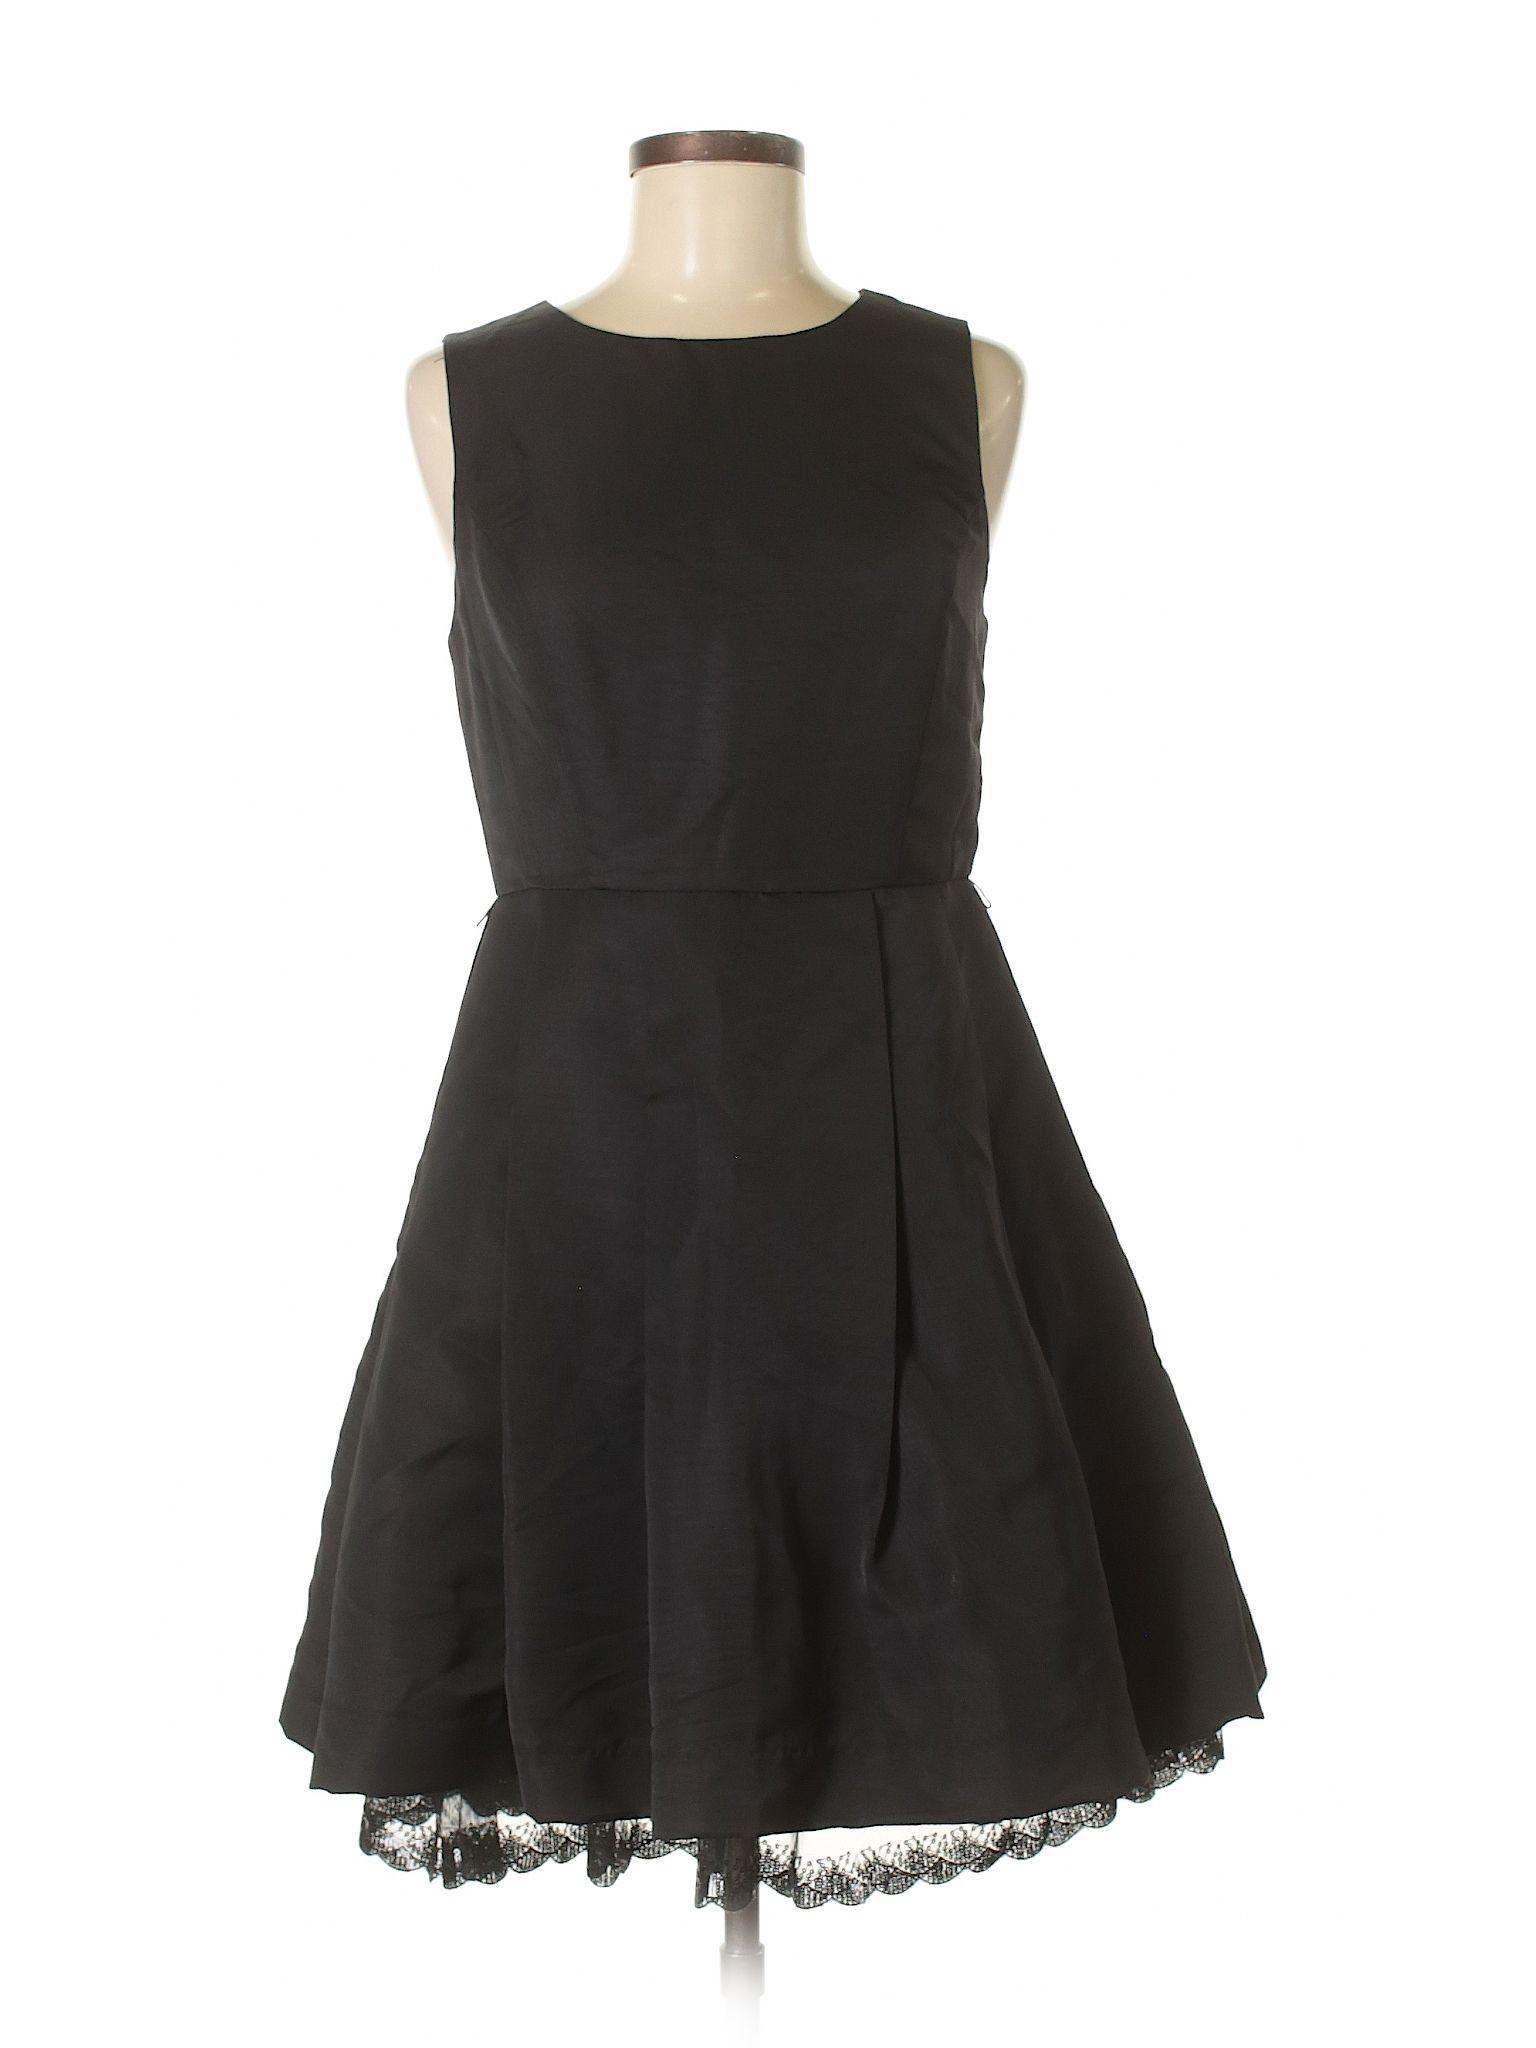 Jason Wu For Target Solid Black Cocktail Dress Size 6 95 Off Black Women Dress Cocktail Dress Dresses [ 2048 x 1536 Pixel ]